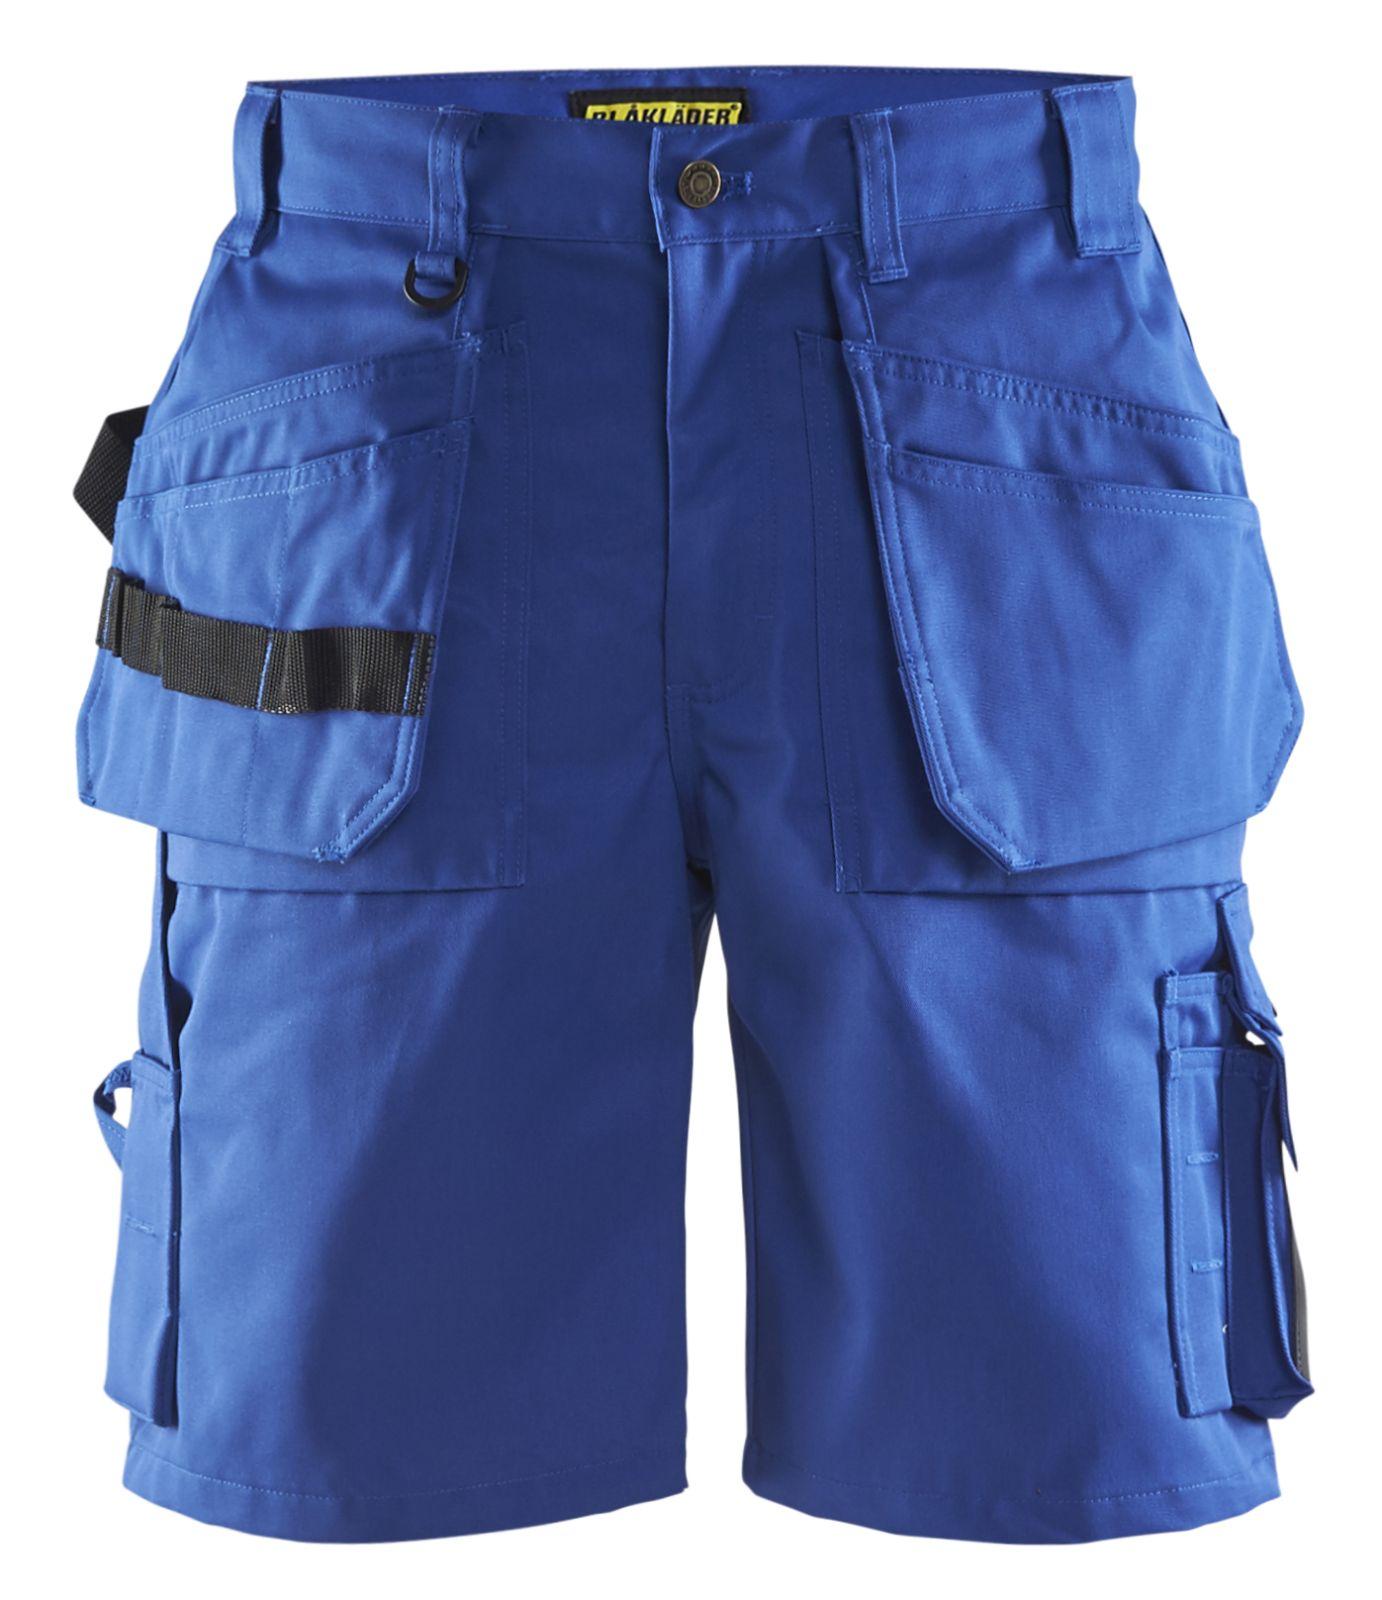 Blaklader Korte werkbroeken 15341860 korenblauw(8500)